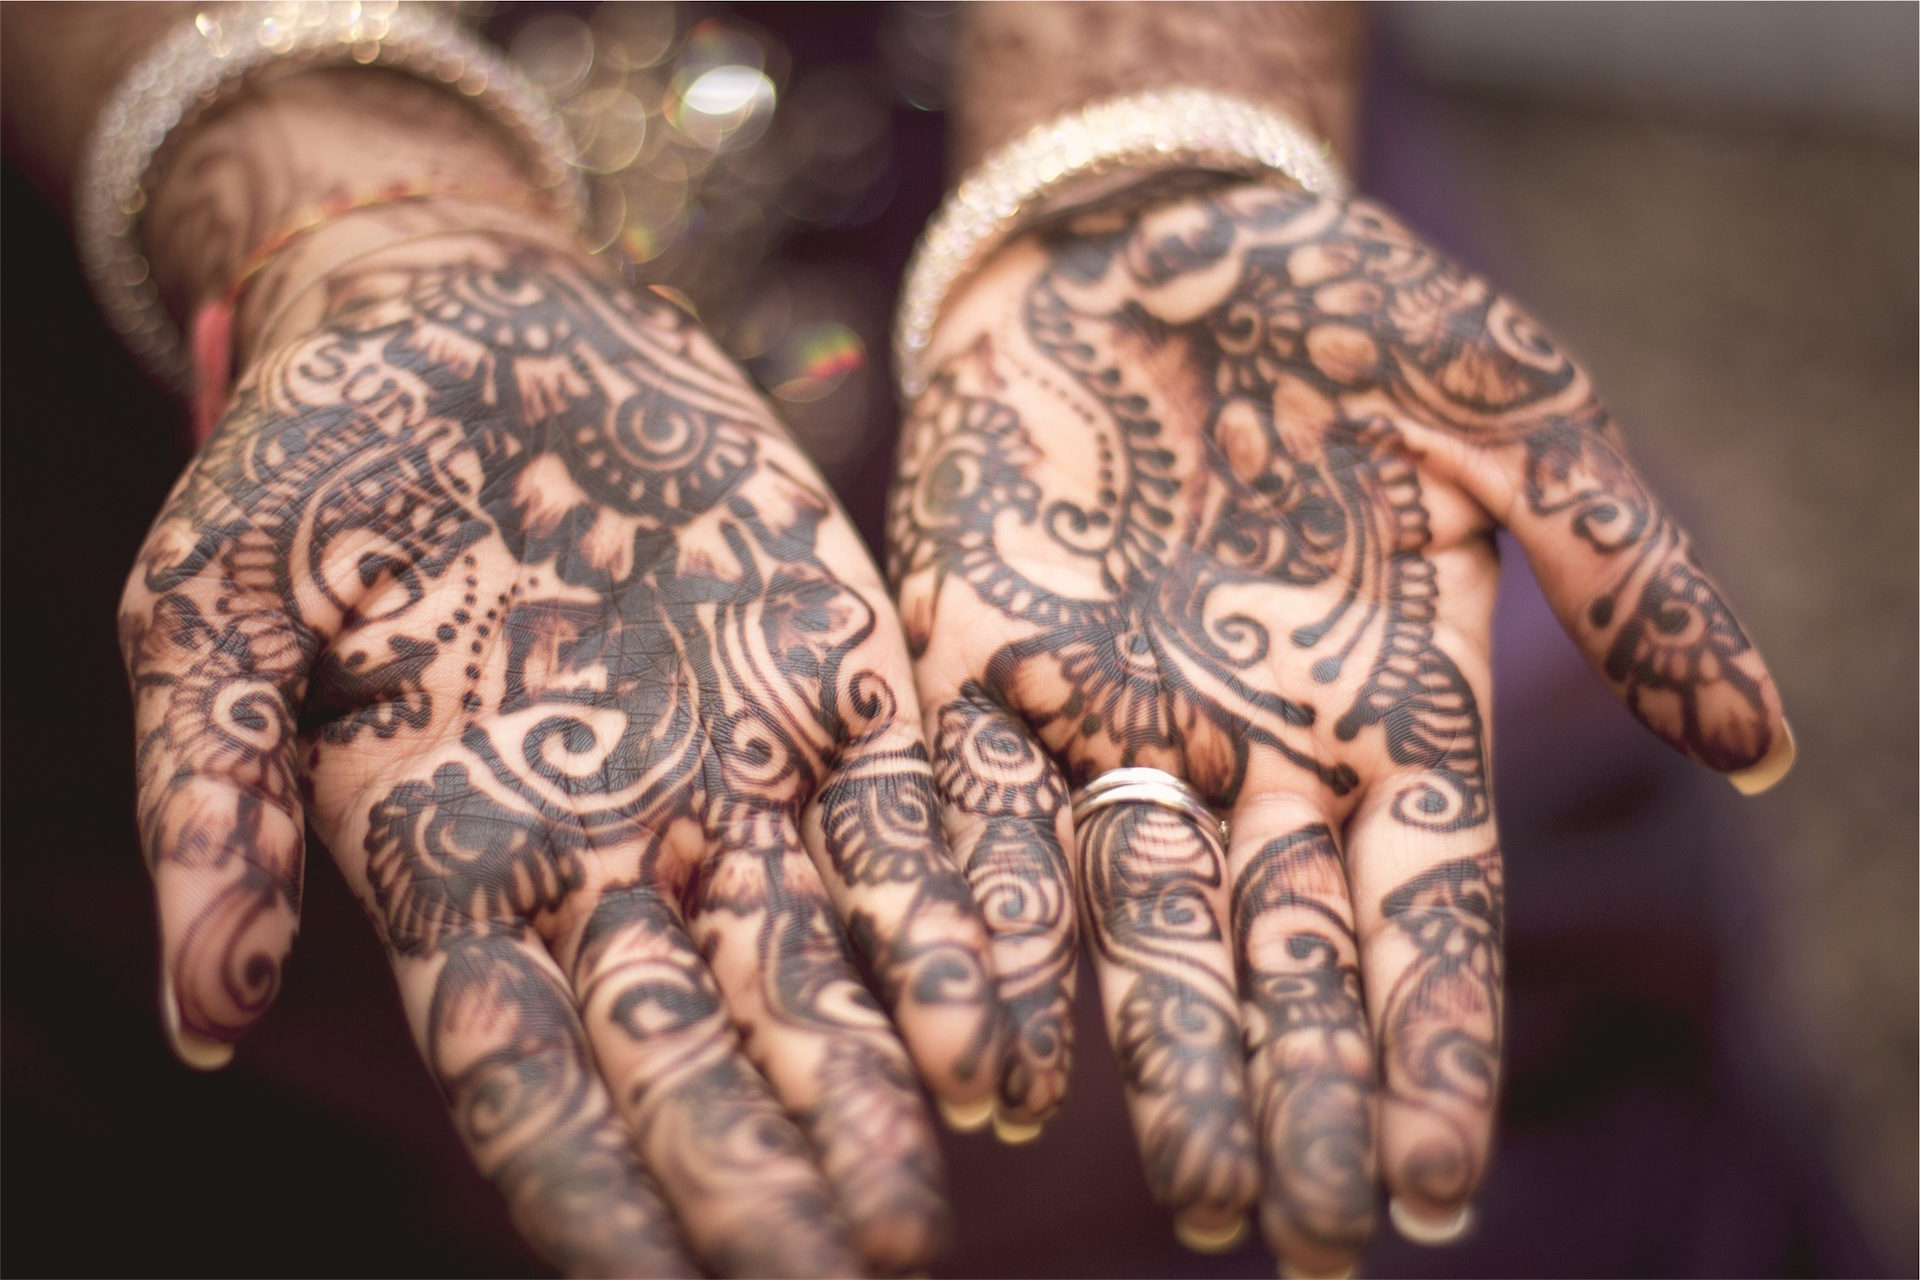 हाथ, tatuajes, कंगन, नाखून, ritos - HD वॉलपेपर - प्रोफेसर-falken.com